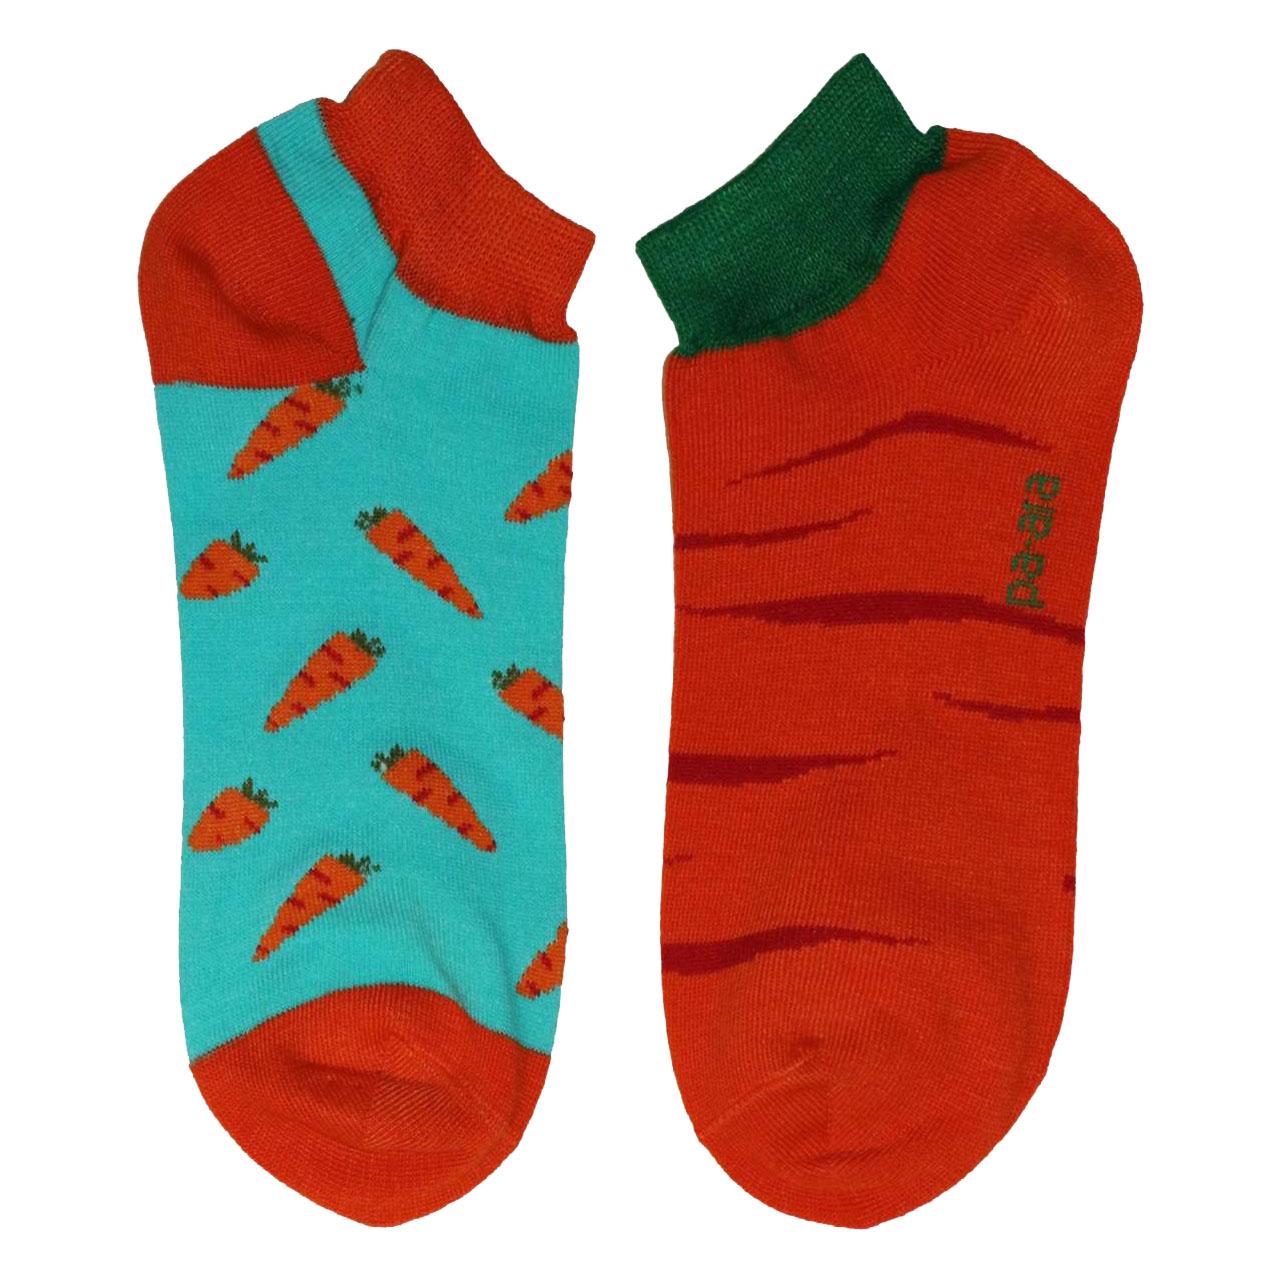 جوراب زنانه پاآرا طرح هویج کد P3